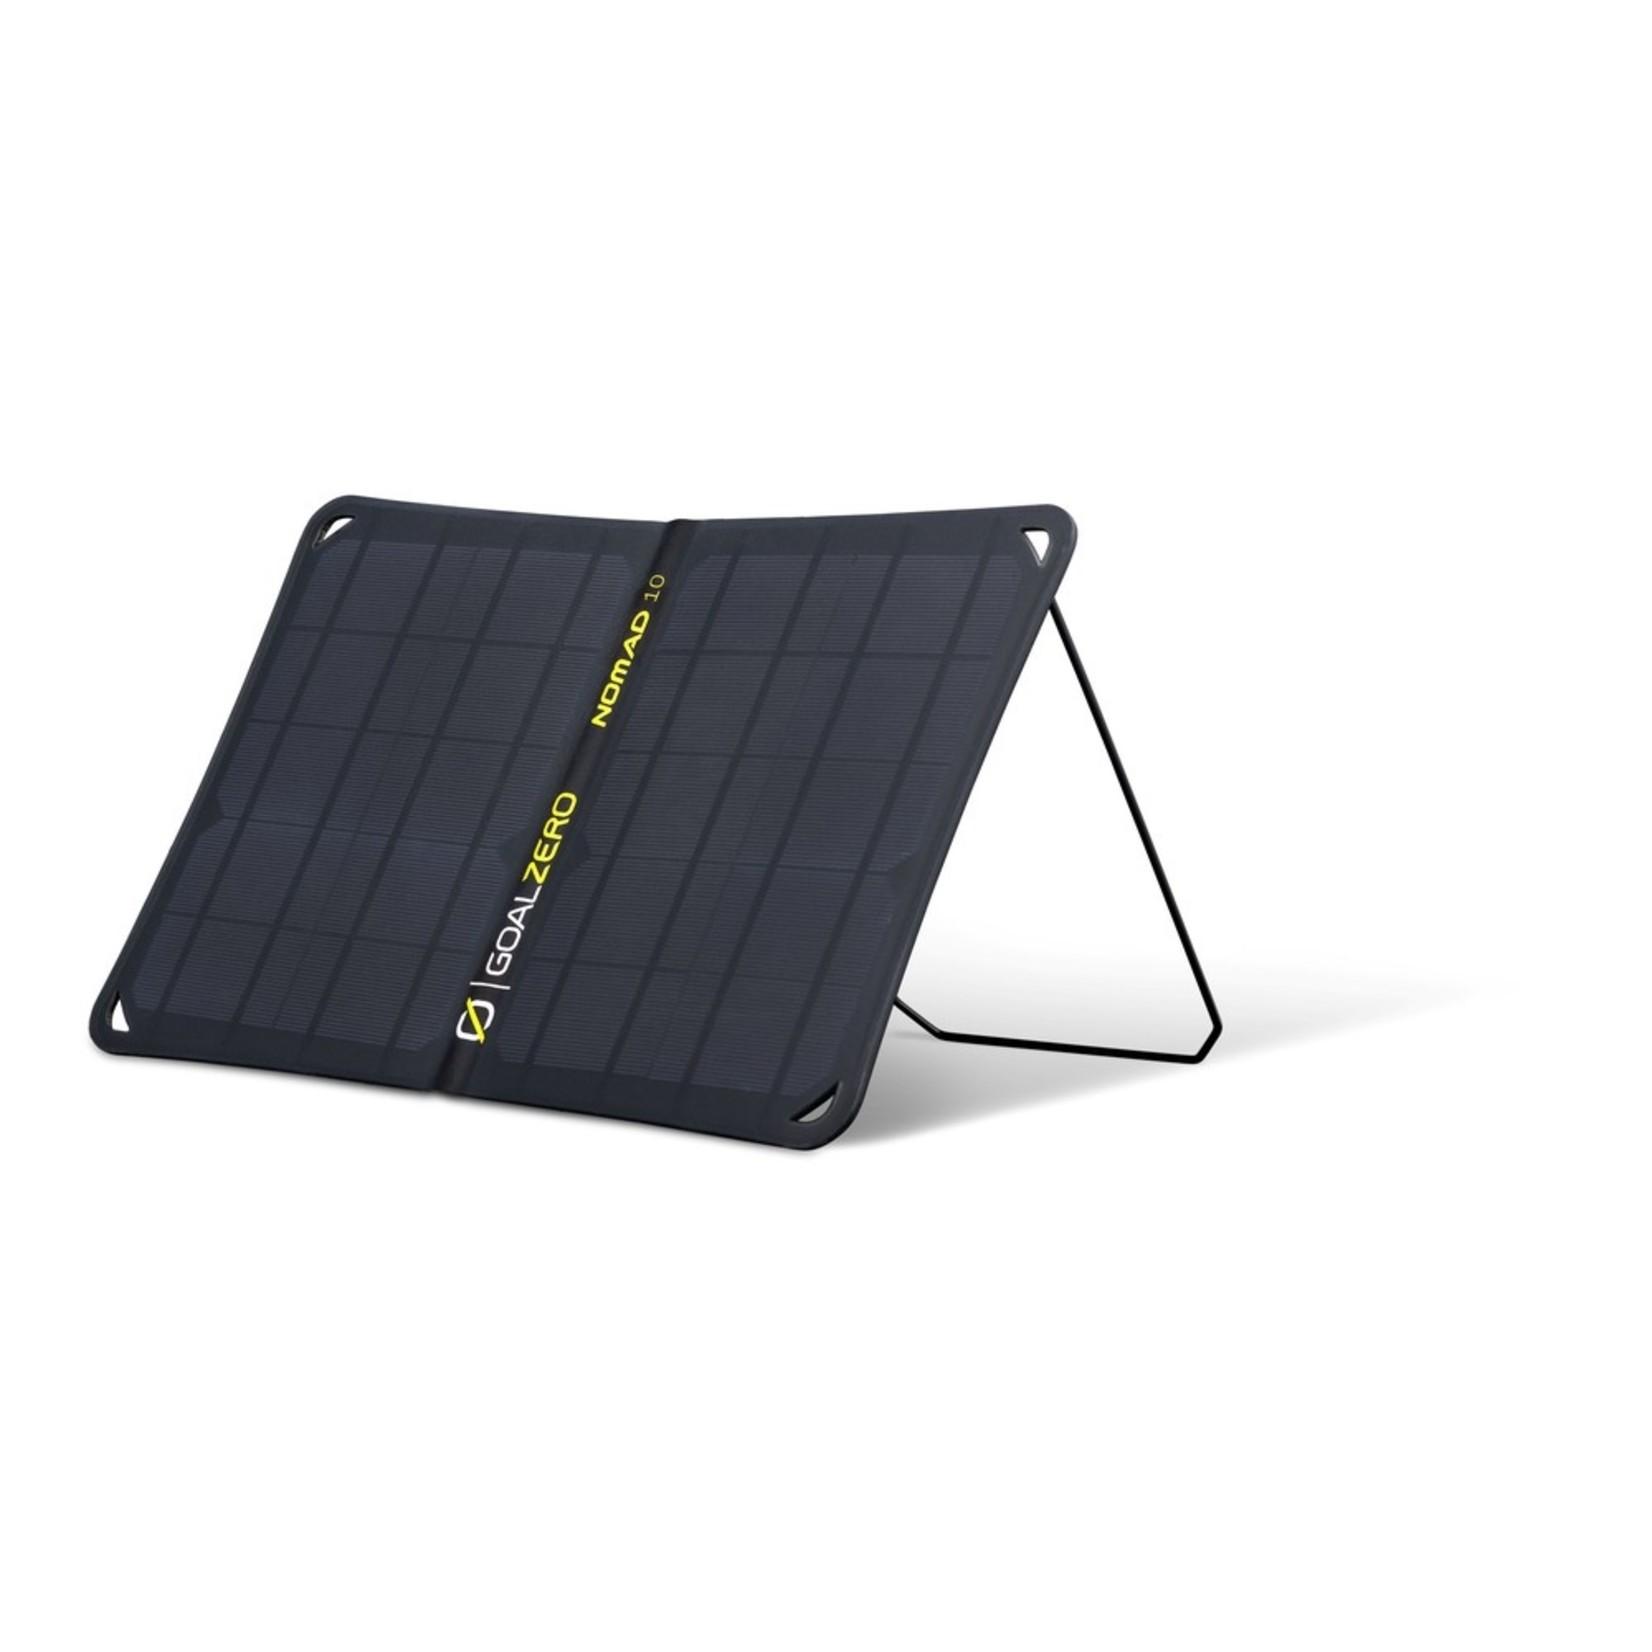 GOALZERO GOAL ZERO Venture 35 + Nomad 10 Kit